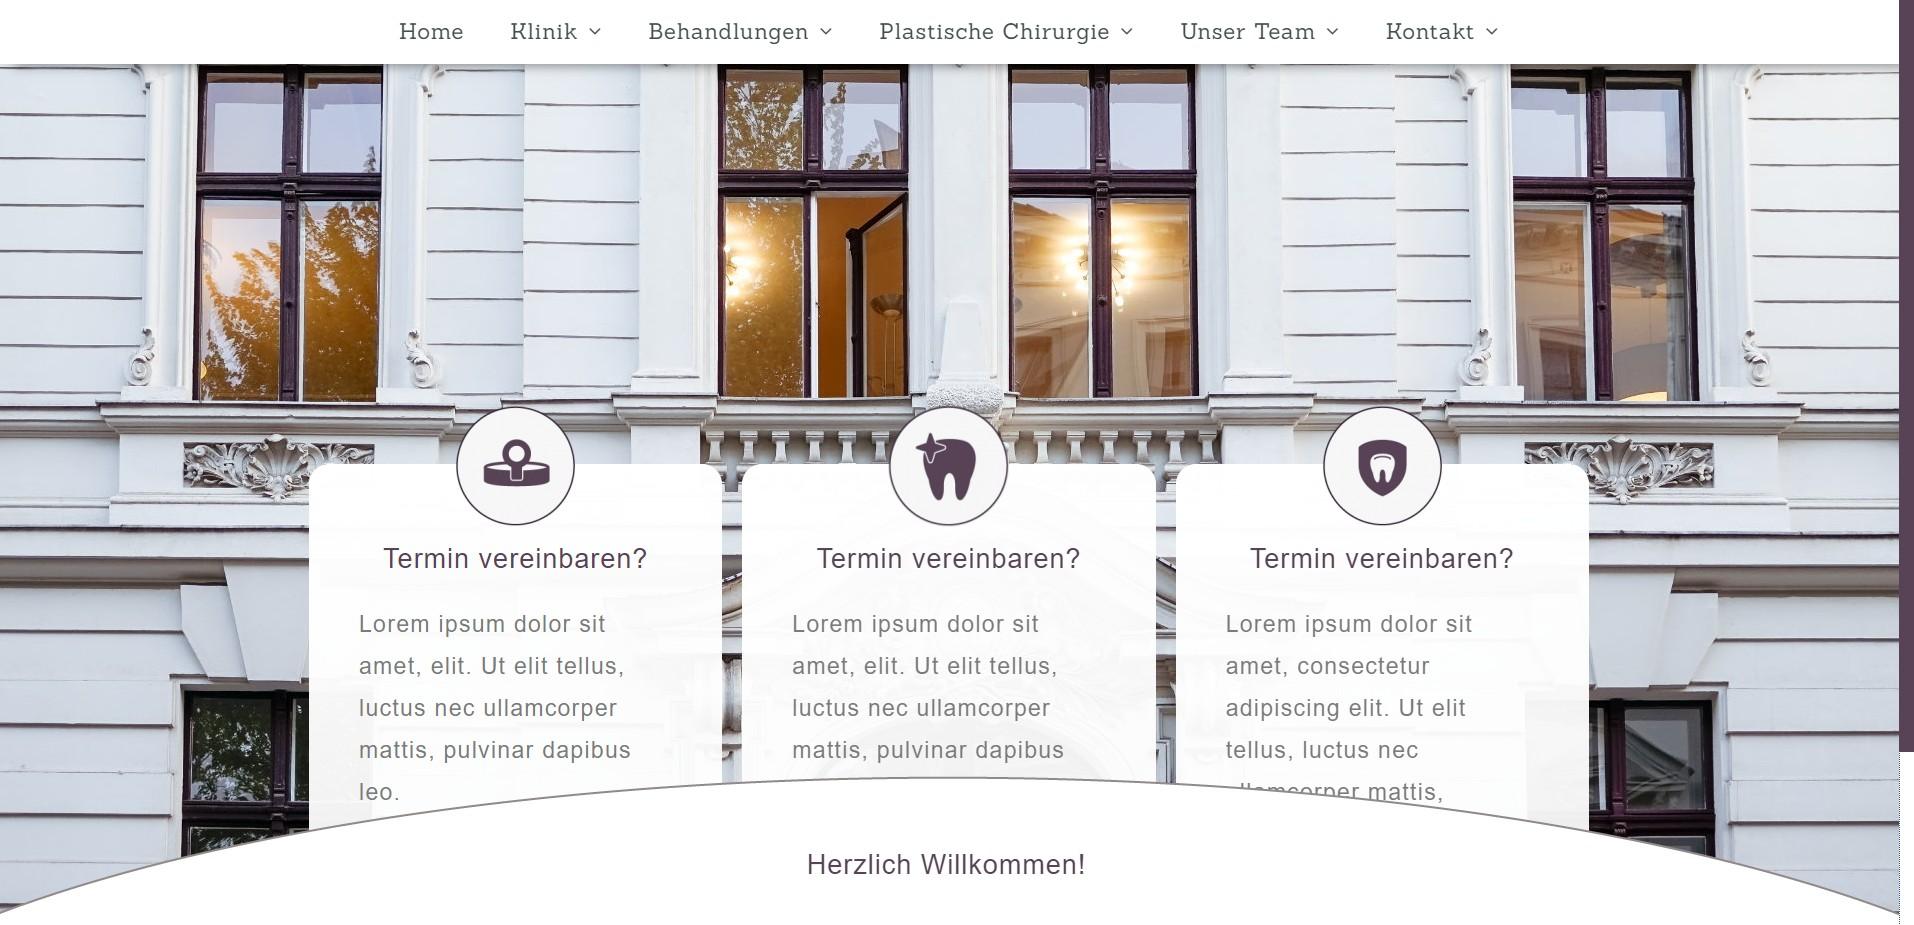 Klinik-Winterthur.ch